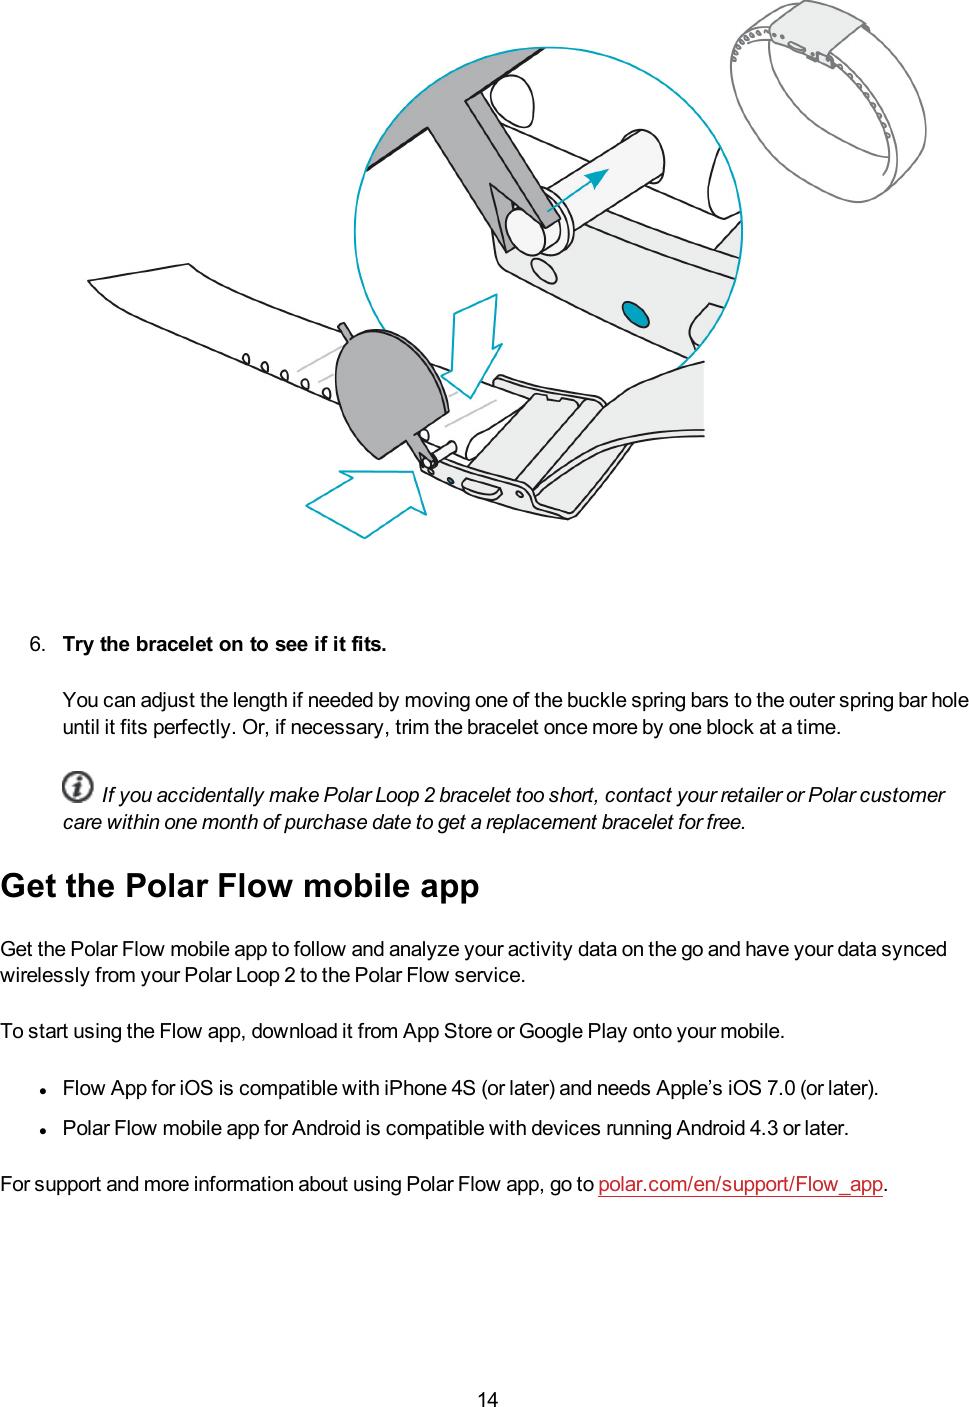 Polar My Loop 2 User Manual UG EN